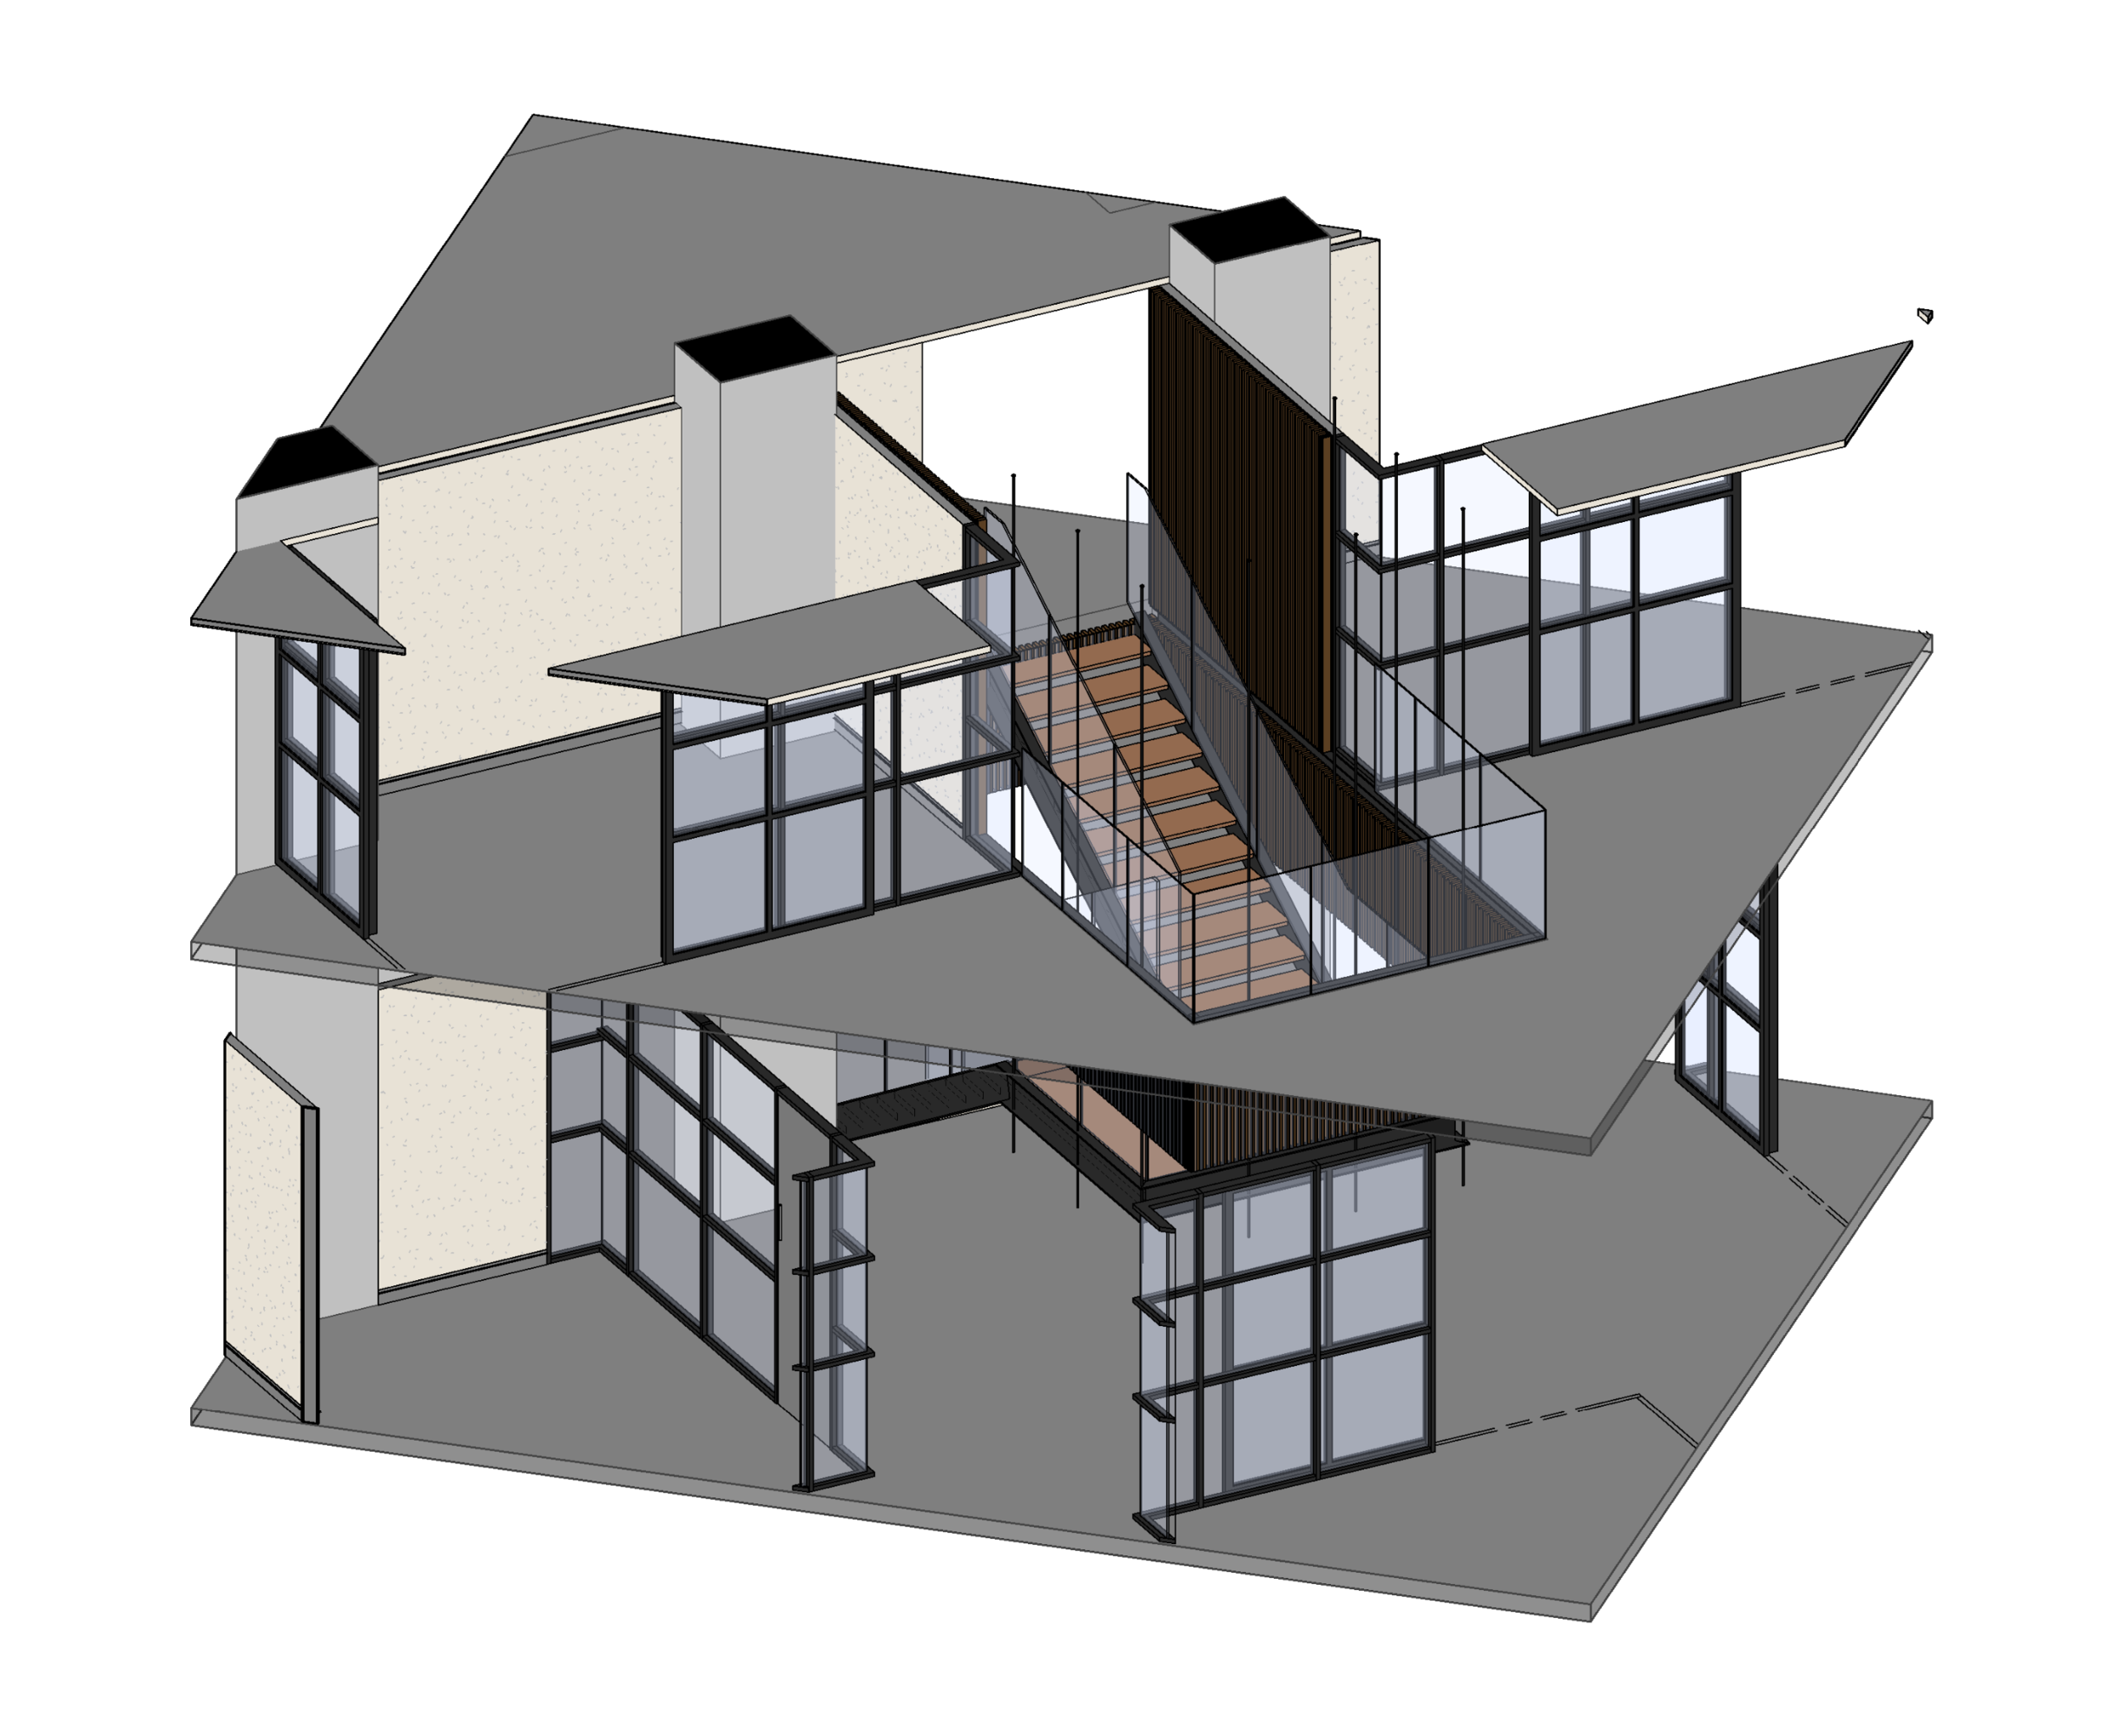 Interconnecting stair detail